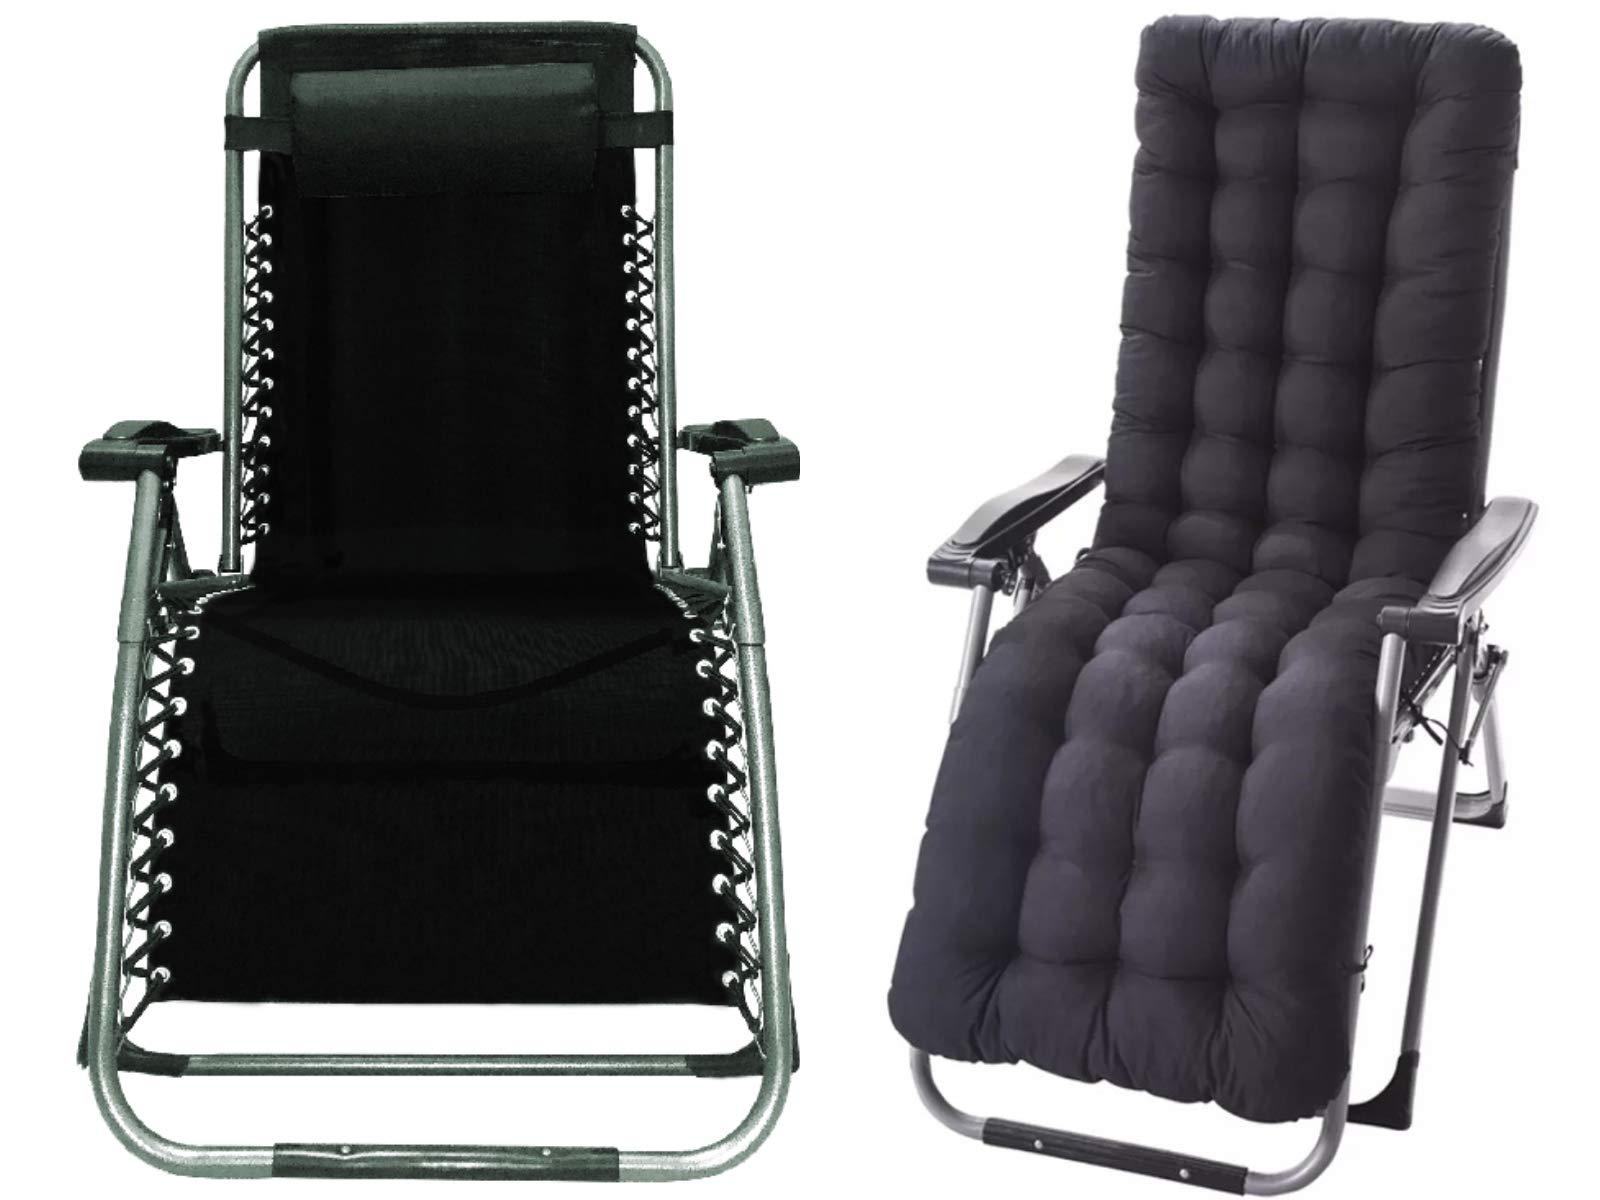 Four Seasons with Cushion Upgraded Heavy Duty Zero Gravity Chair Lounge Recliner Folding Adjustable Portable Office  sc 1 st  Amazon.com & Zero Gravity Office Chair: Amazon.com